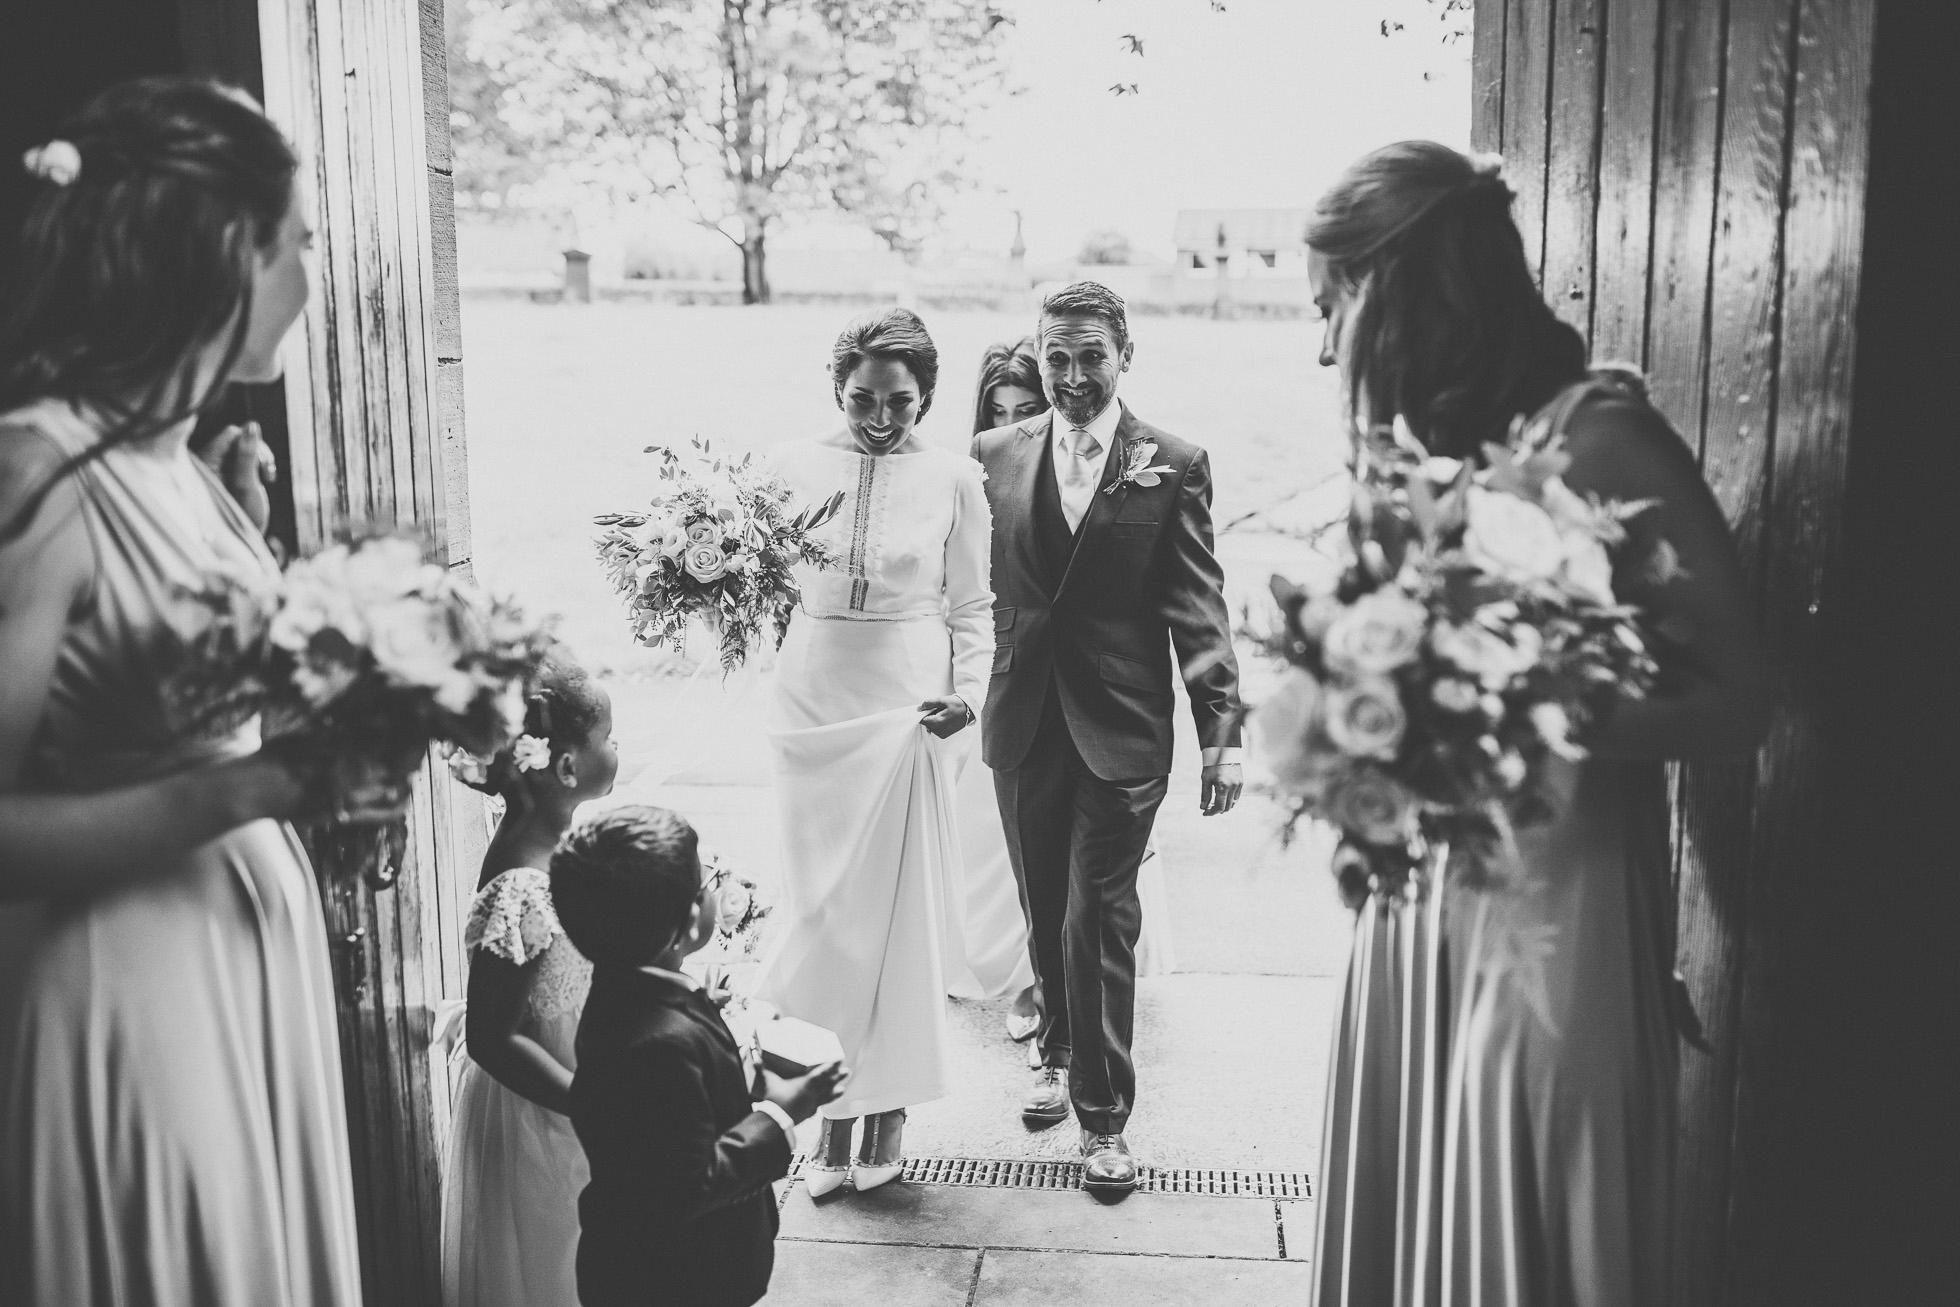 woodman_inn_thunderbridge_wedding_photographer-47.jpg